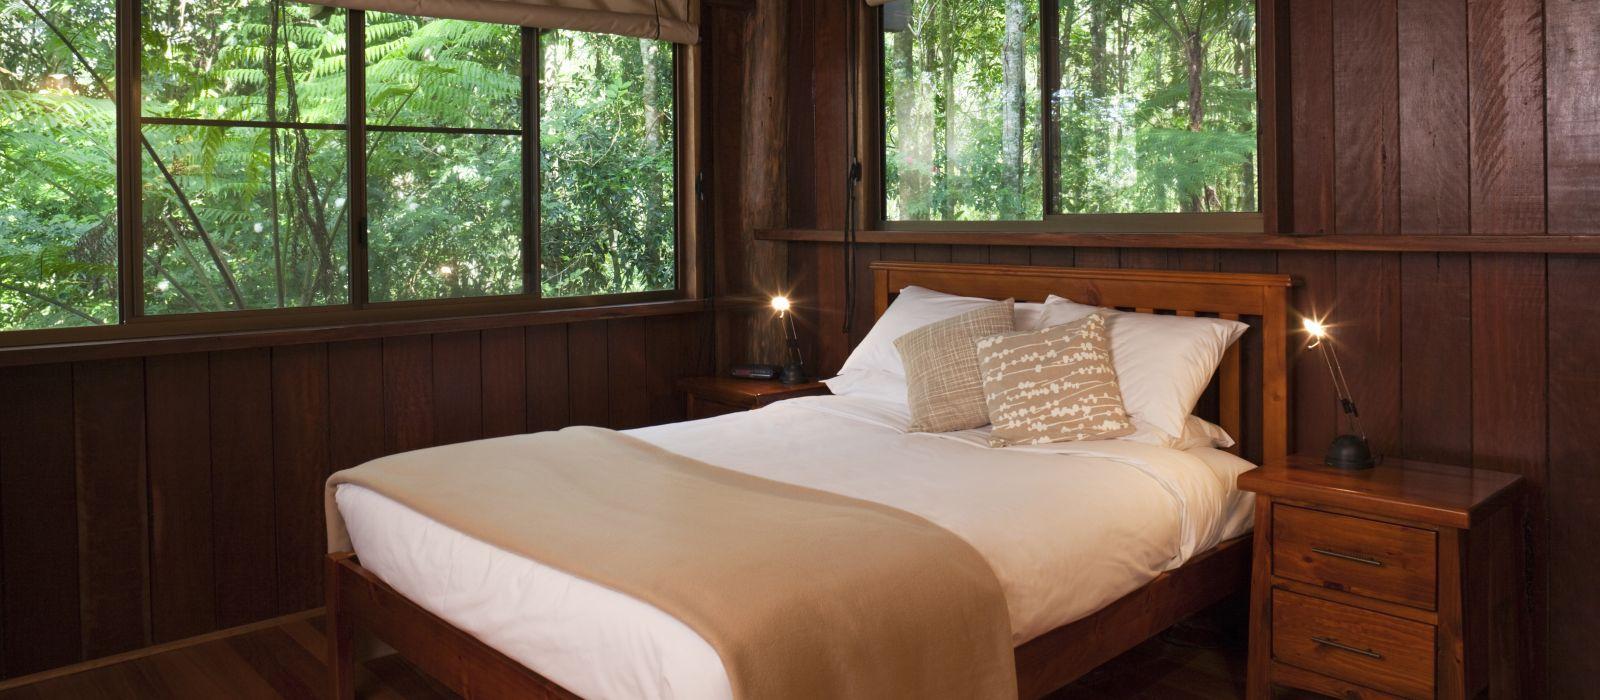 Hotel Rose Gums Wilderness Retreat Australien